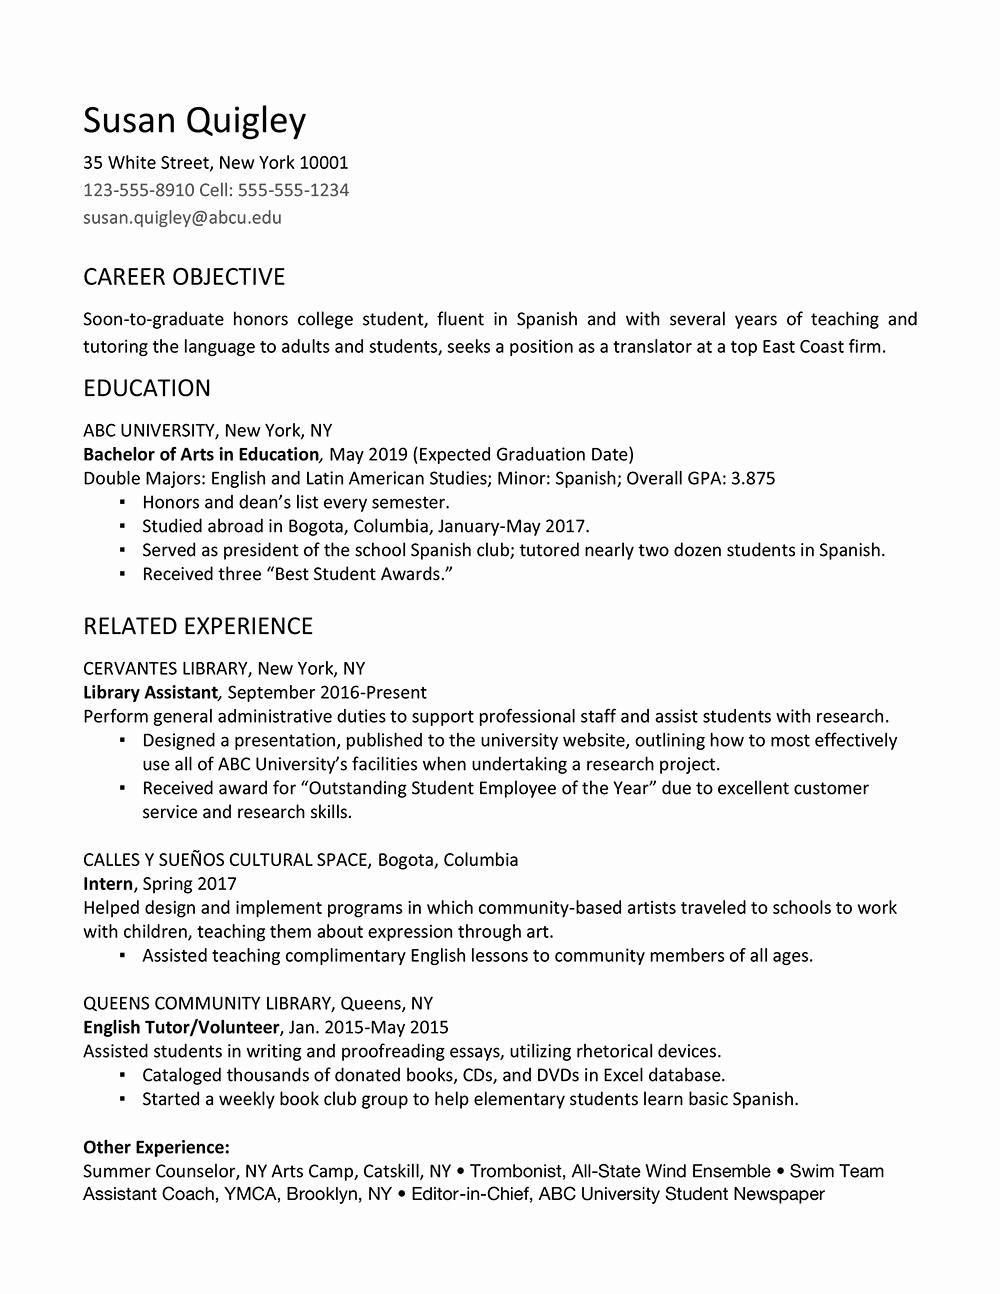 Sample Resume for College Graduate New Job Resume for Fresh Graduate College